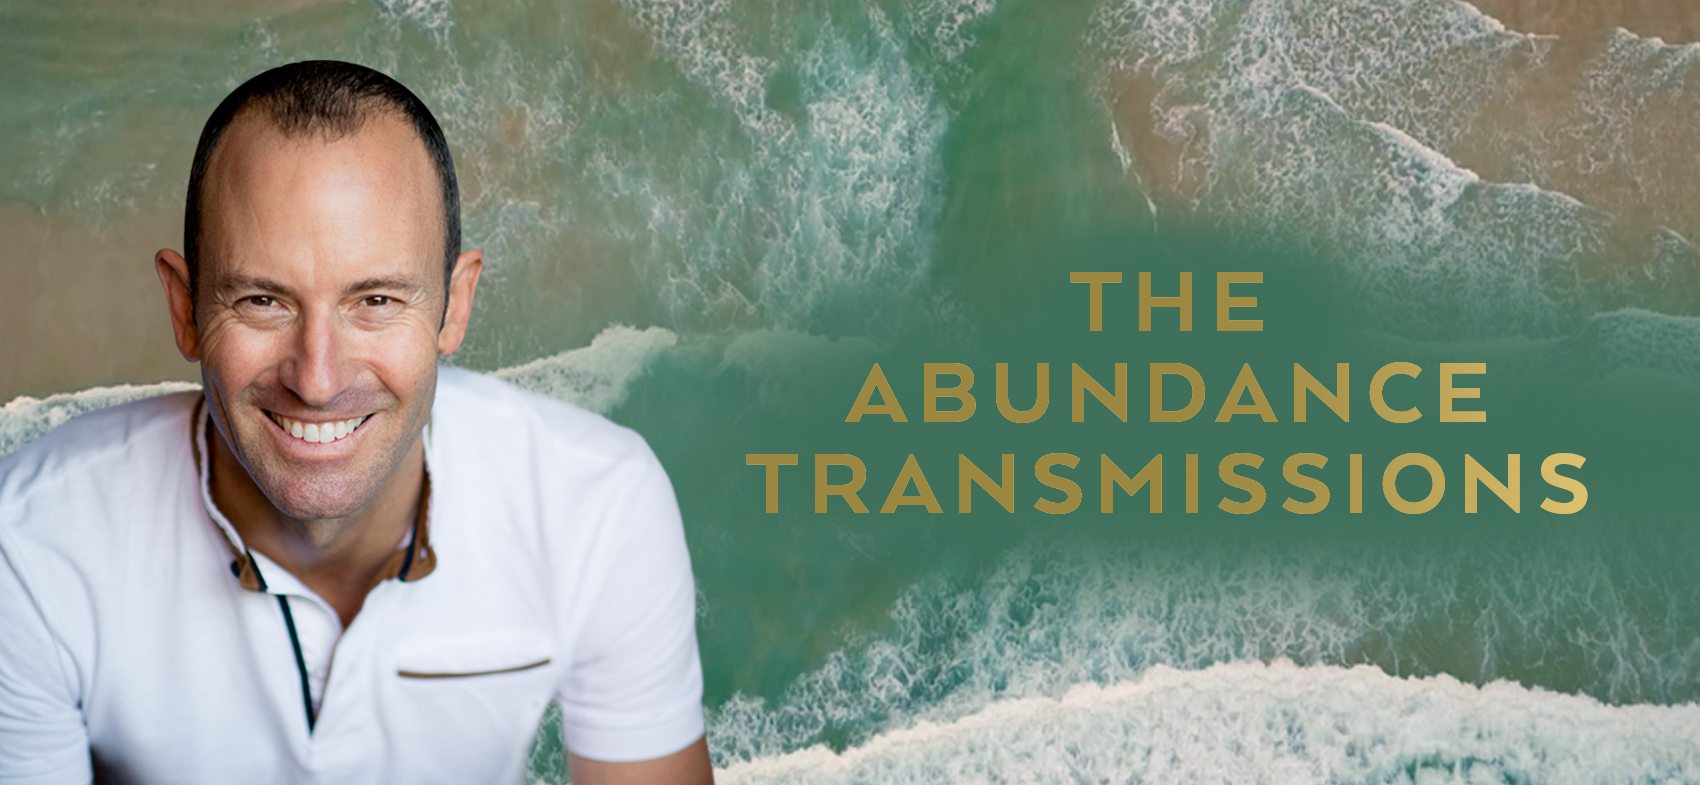 The Abundance Transmissions - Jason Snaddon